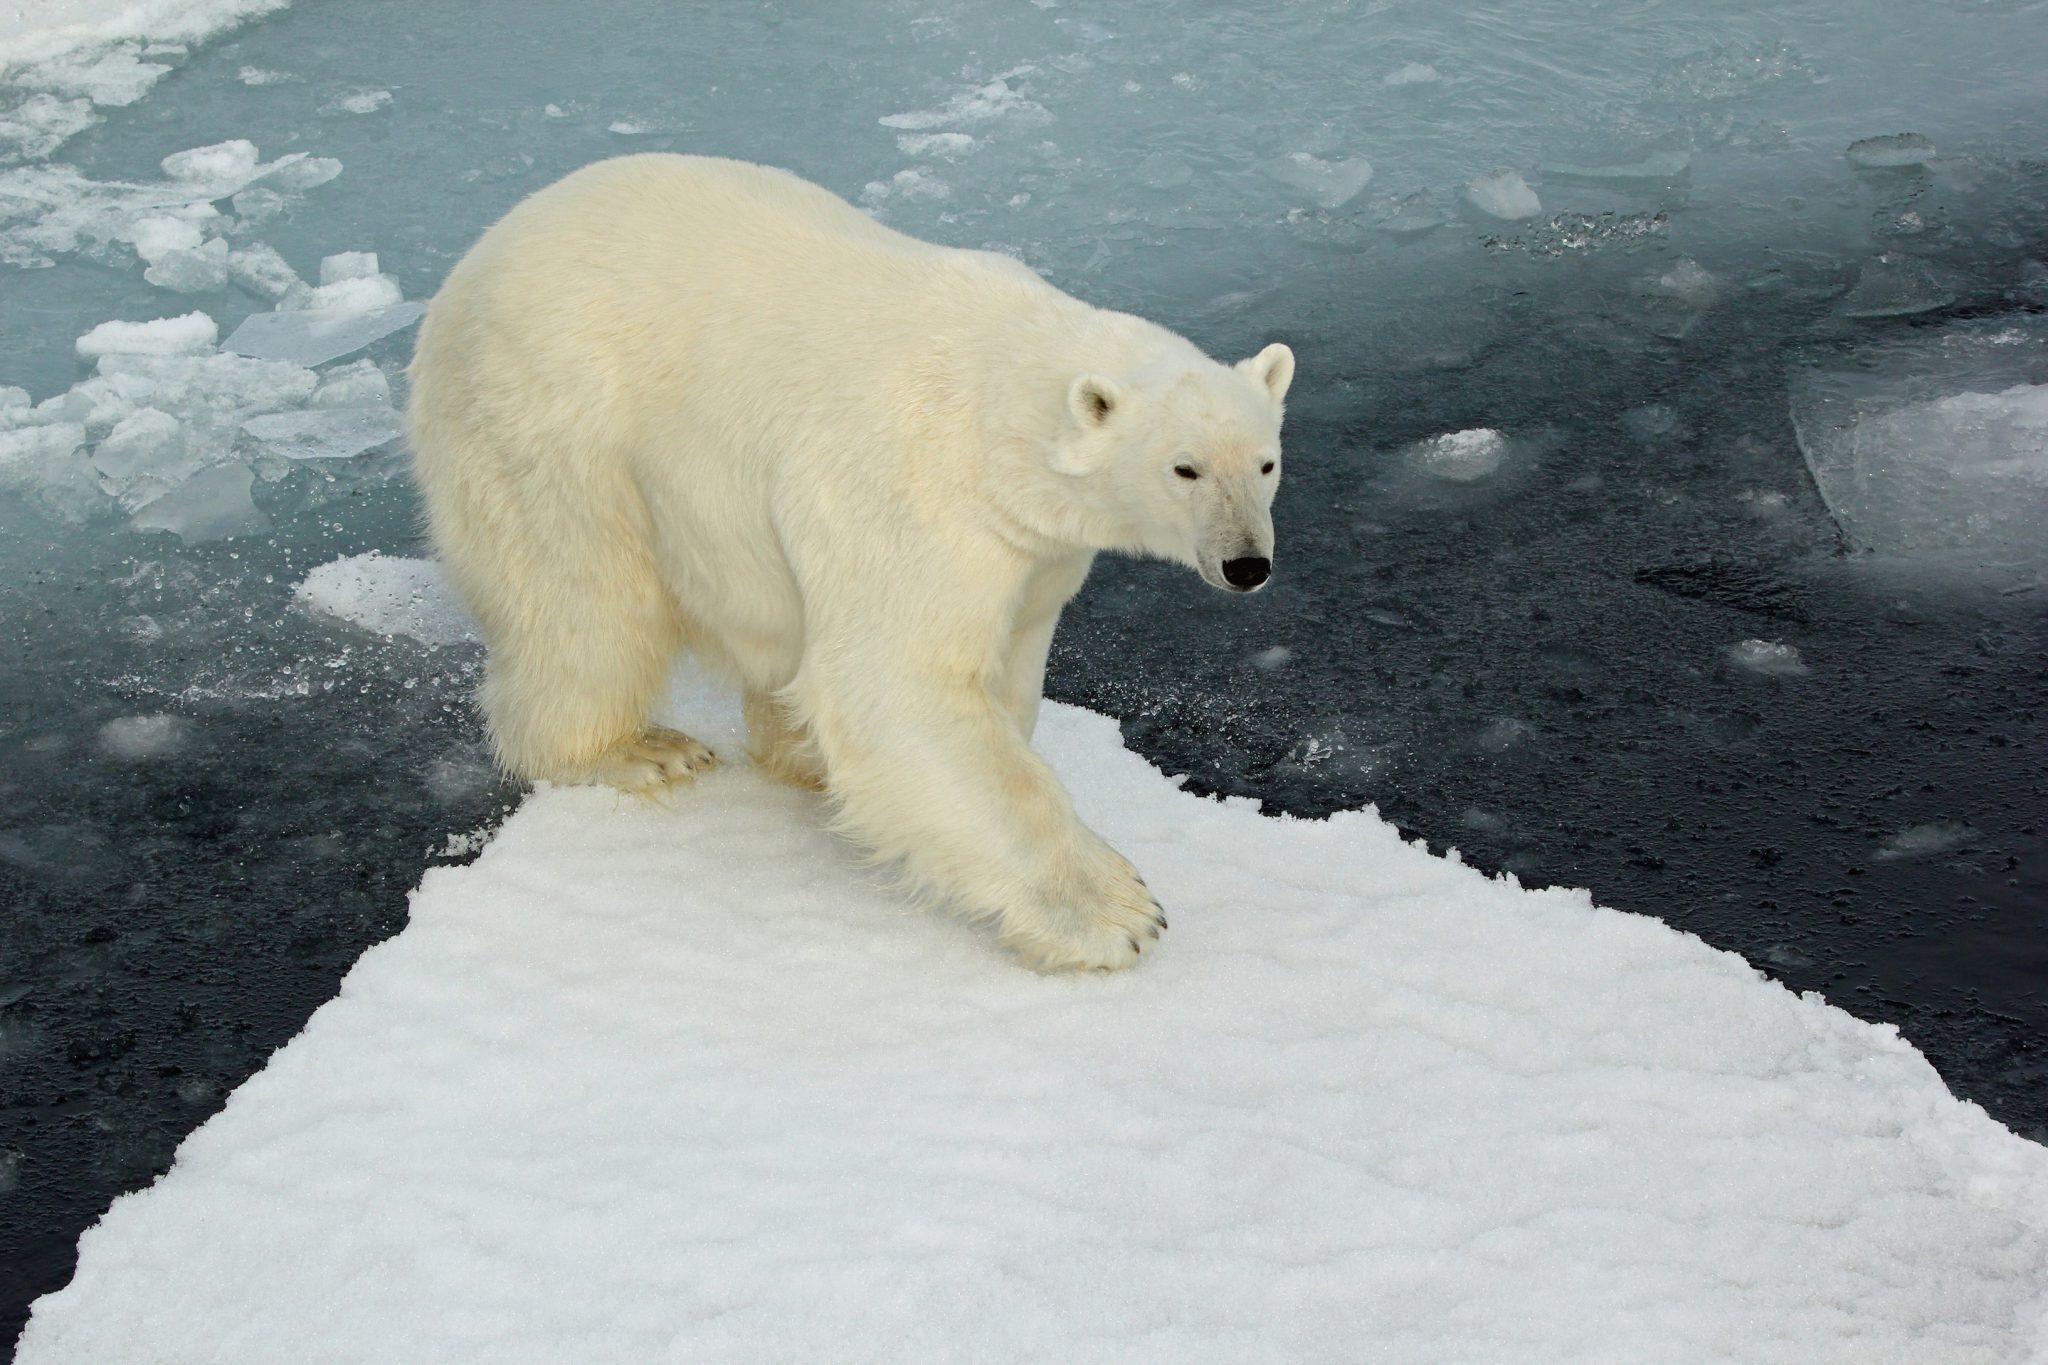 Polar Bear Photo taken by Brian Clasper